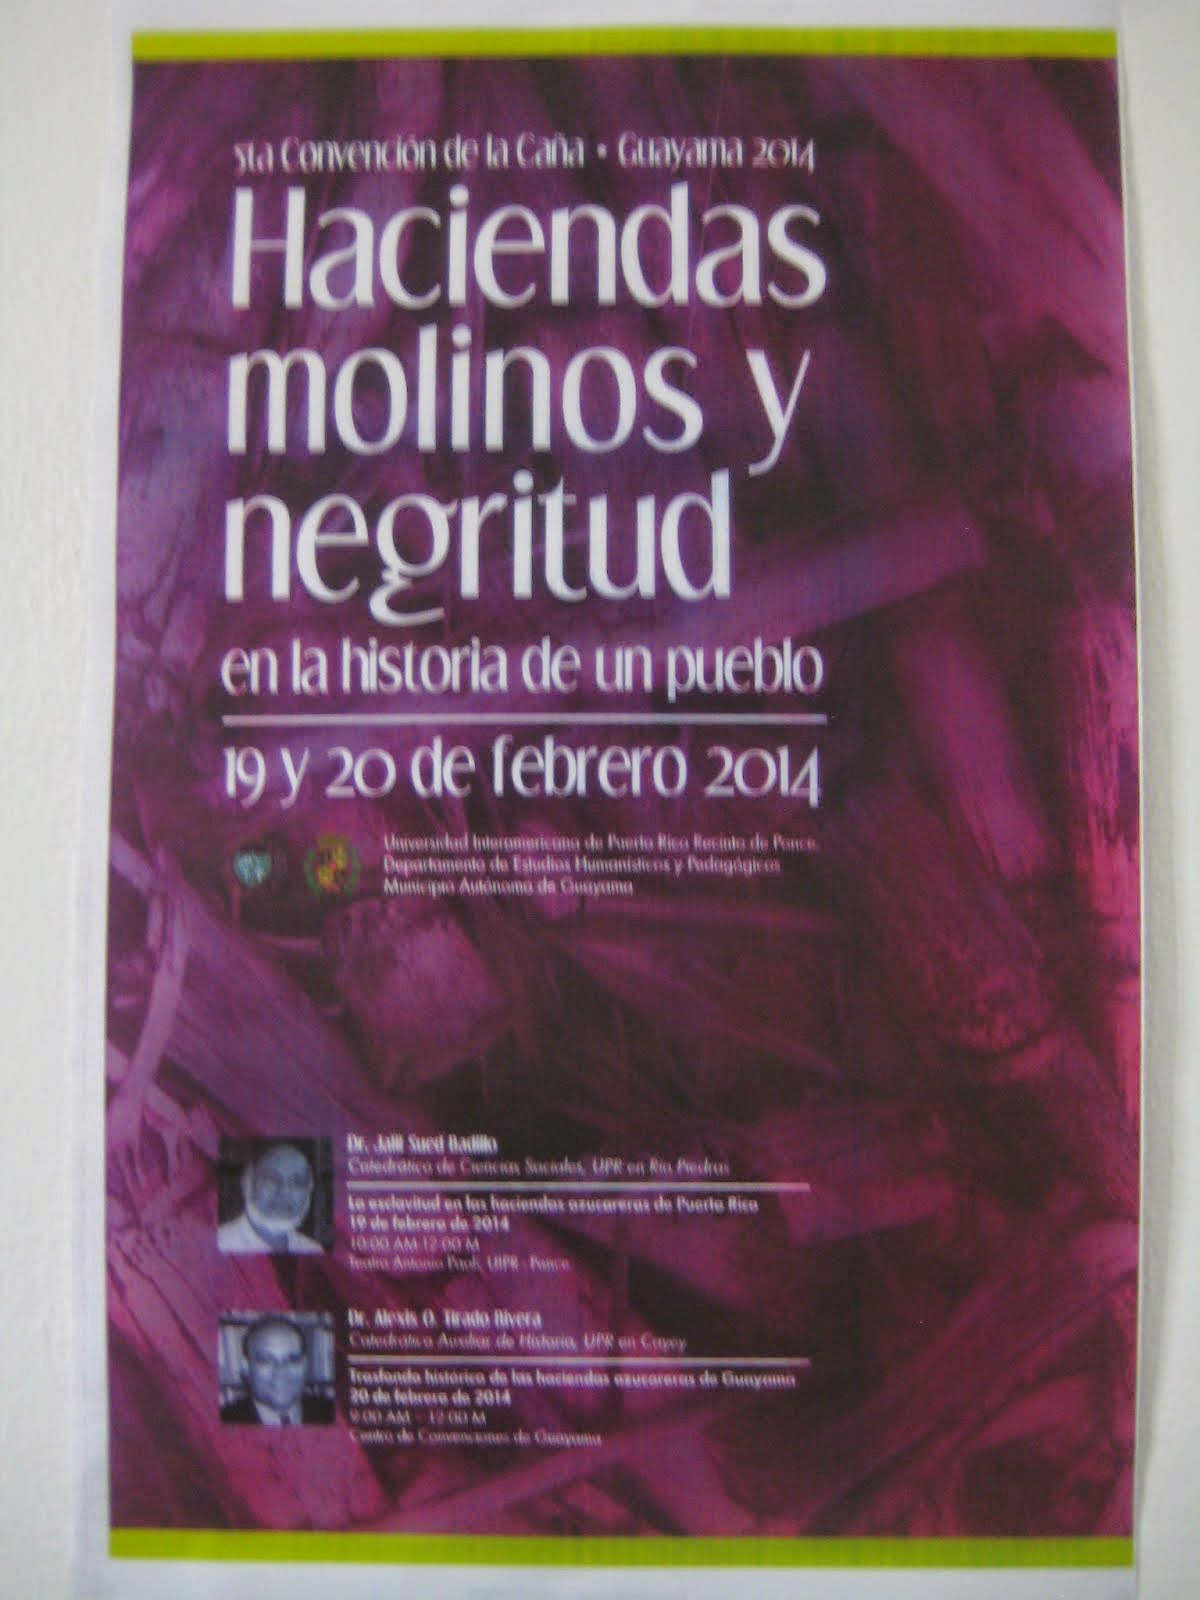 5 ta CONVENCION DE LA CAÑA, Guayama 2014